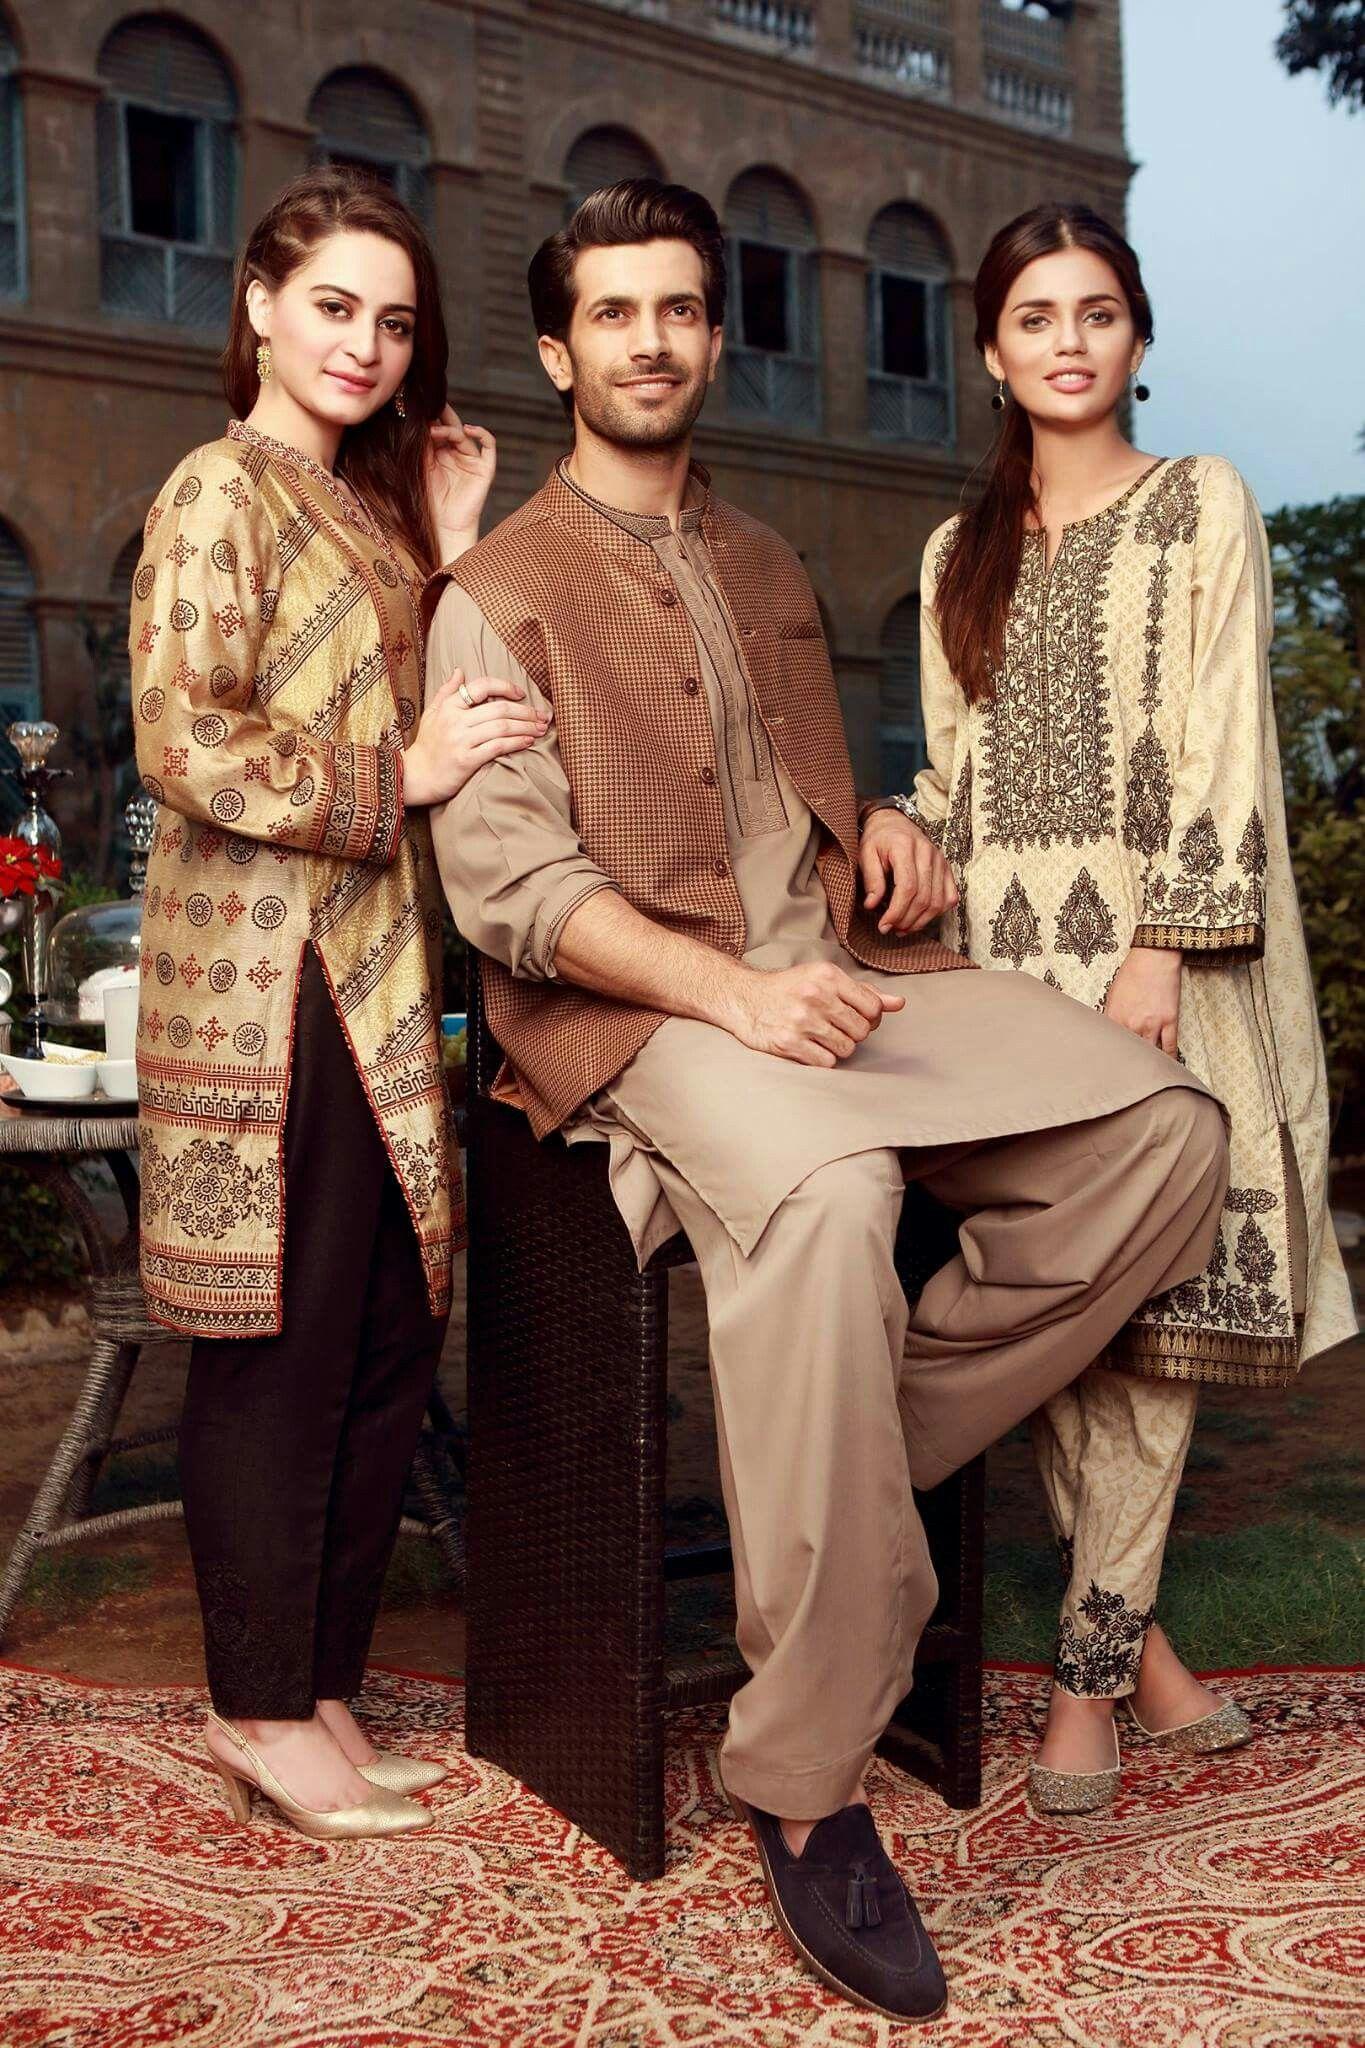 Beautiful Aiman Khan, Shahzad Noor and Faiza Ashfaq Shoot of Eid Collection! #AimanKhan #Shahzad_Noor #FaizaAshfaq #Edenrobe #EidCollection17 #SummerCasual #PakistaniFashion #PakistaniCelebrities ✨